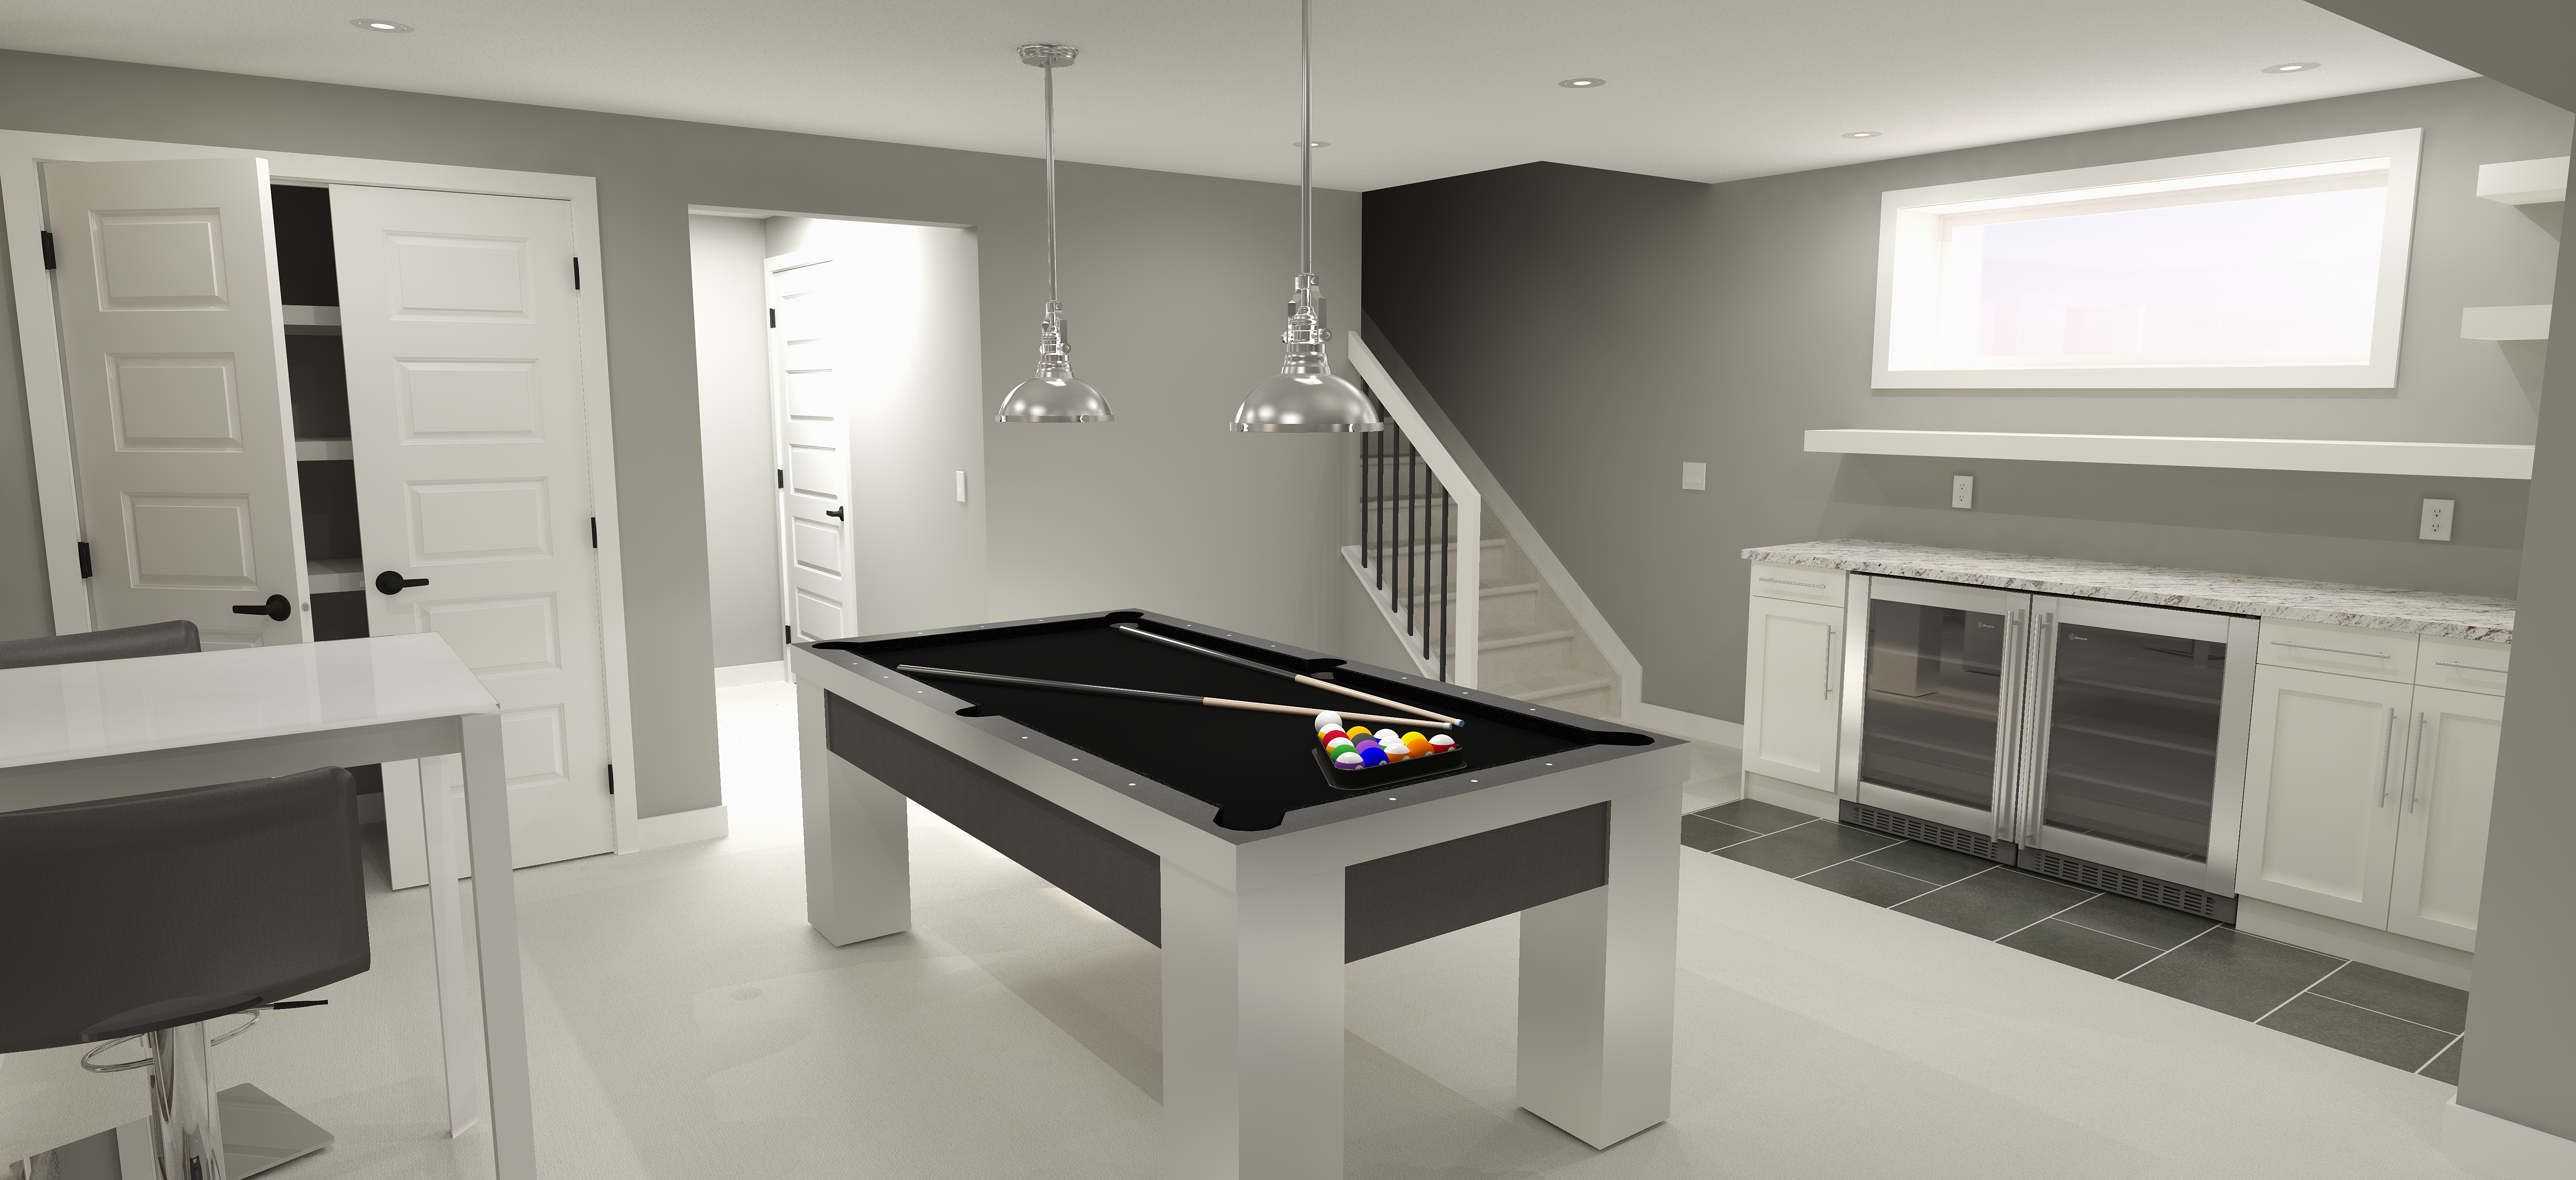 Home Residence By Design Inc Edmonton Home Design - Custom home design edmonton